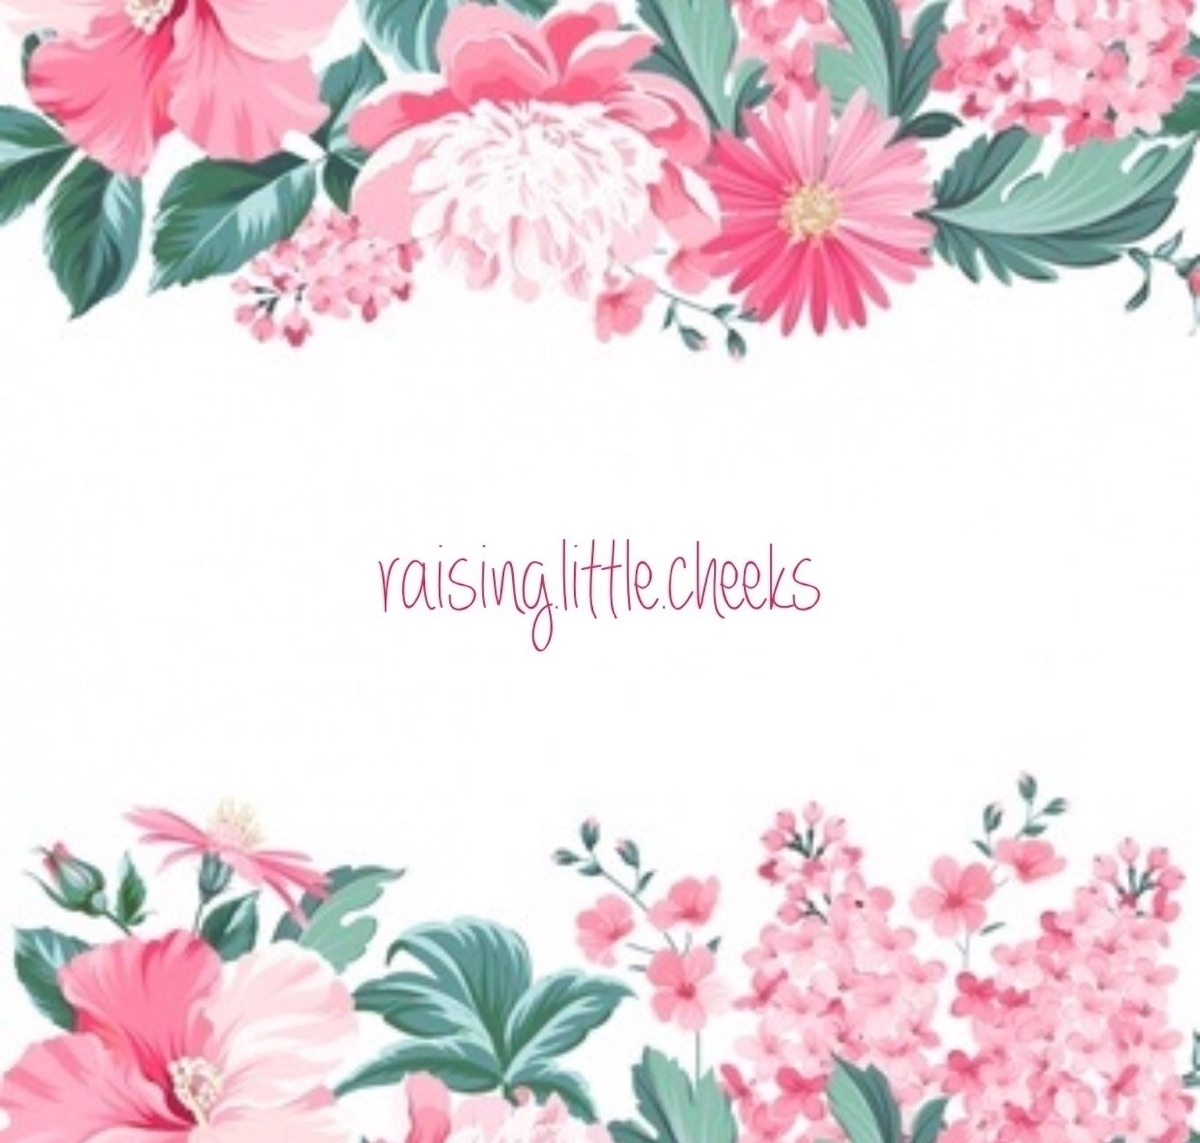 @raisinglittlecheeks Cover Image